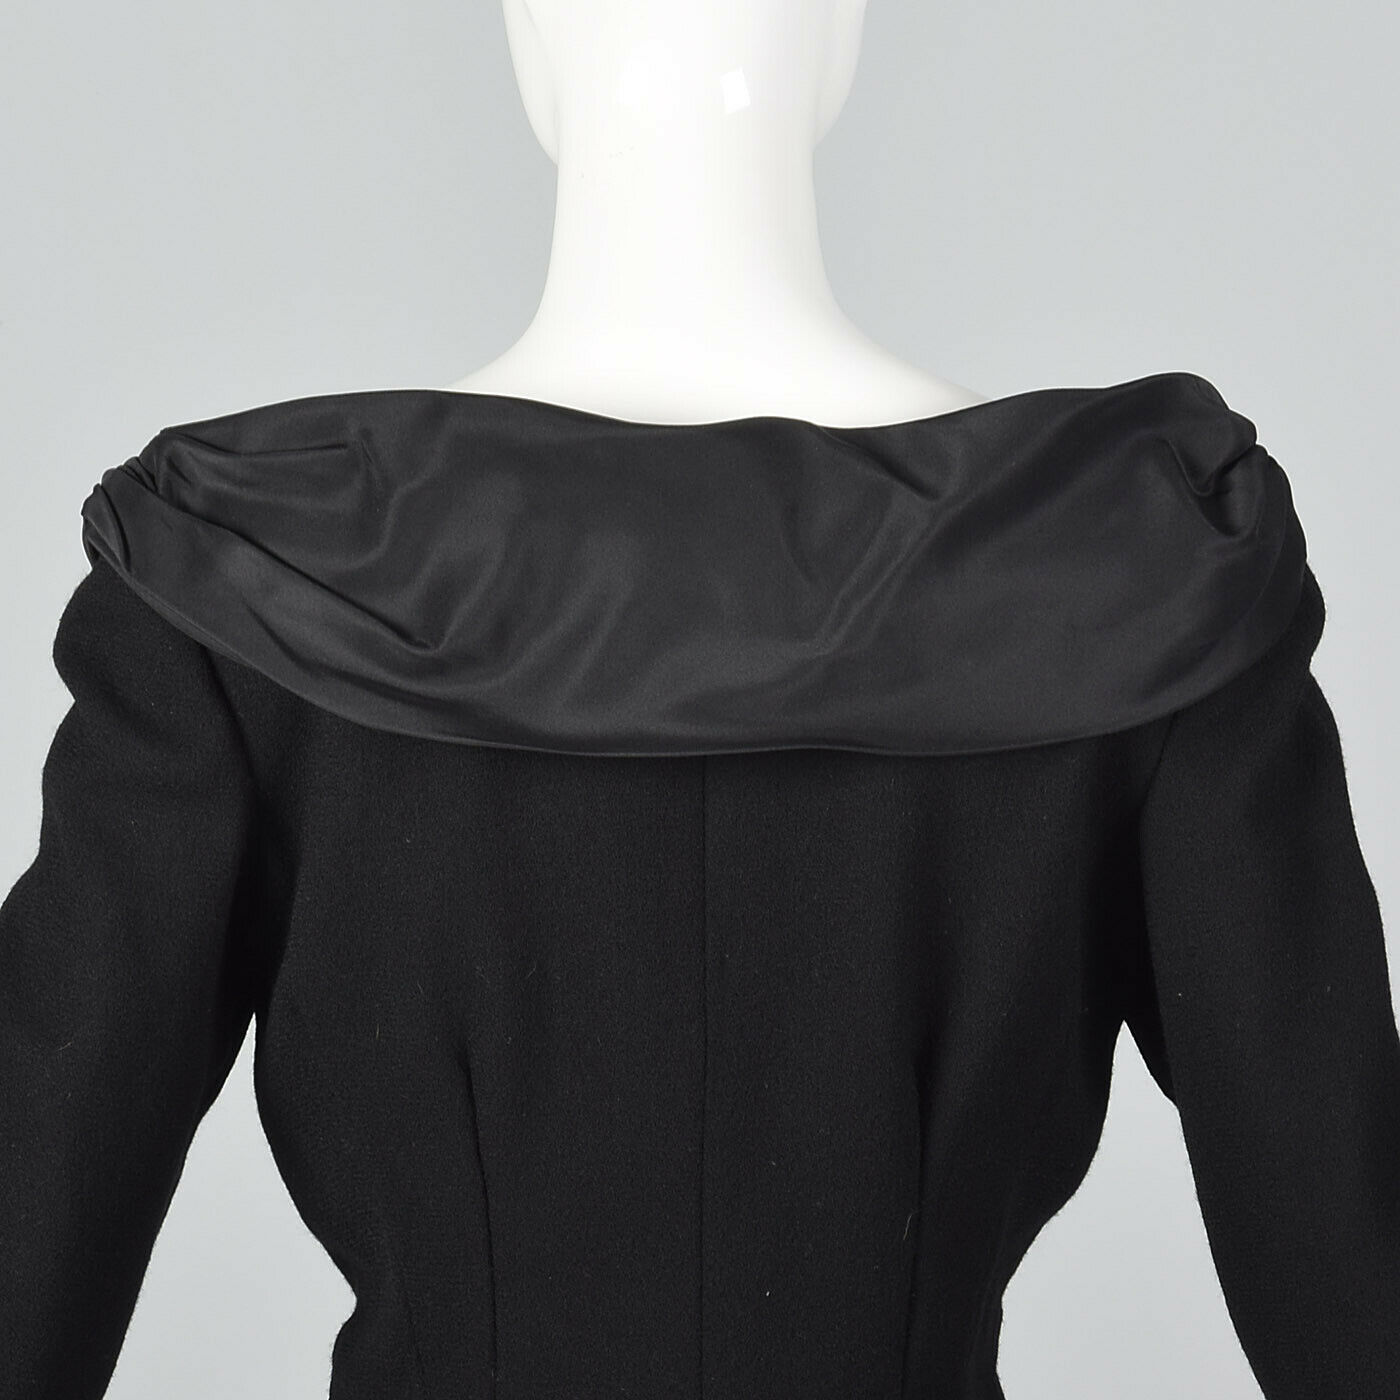 M M M 1980s Bill Blass Long Sleeve Pencil Dress Winter Simple Vintage Wool 80s VTG d899b3